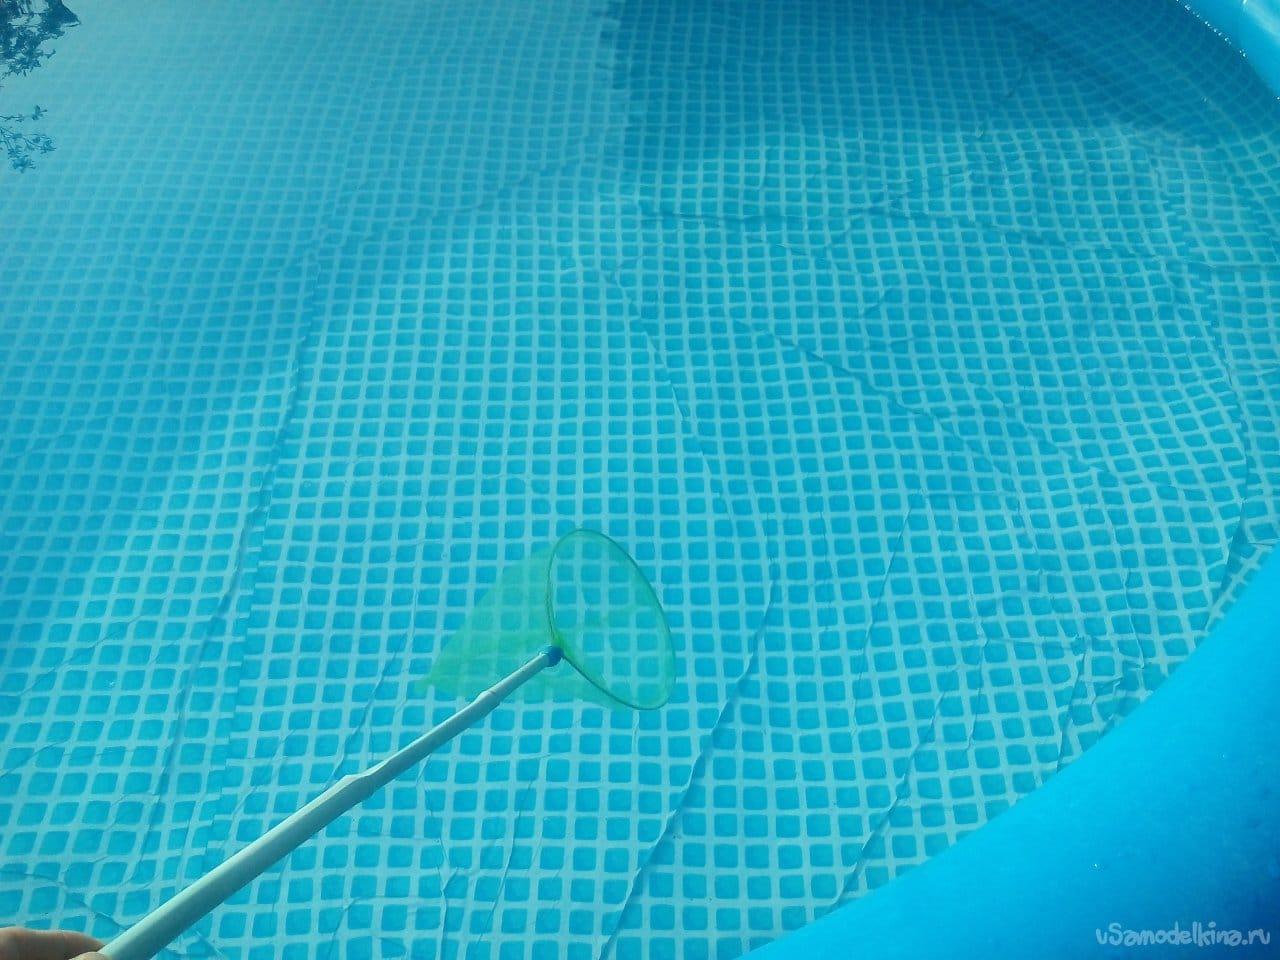 Garden pool. Operating tips